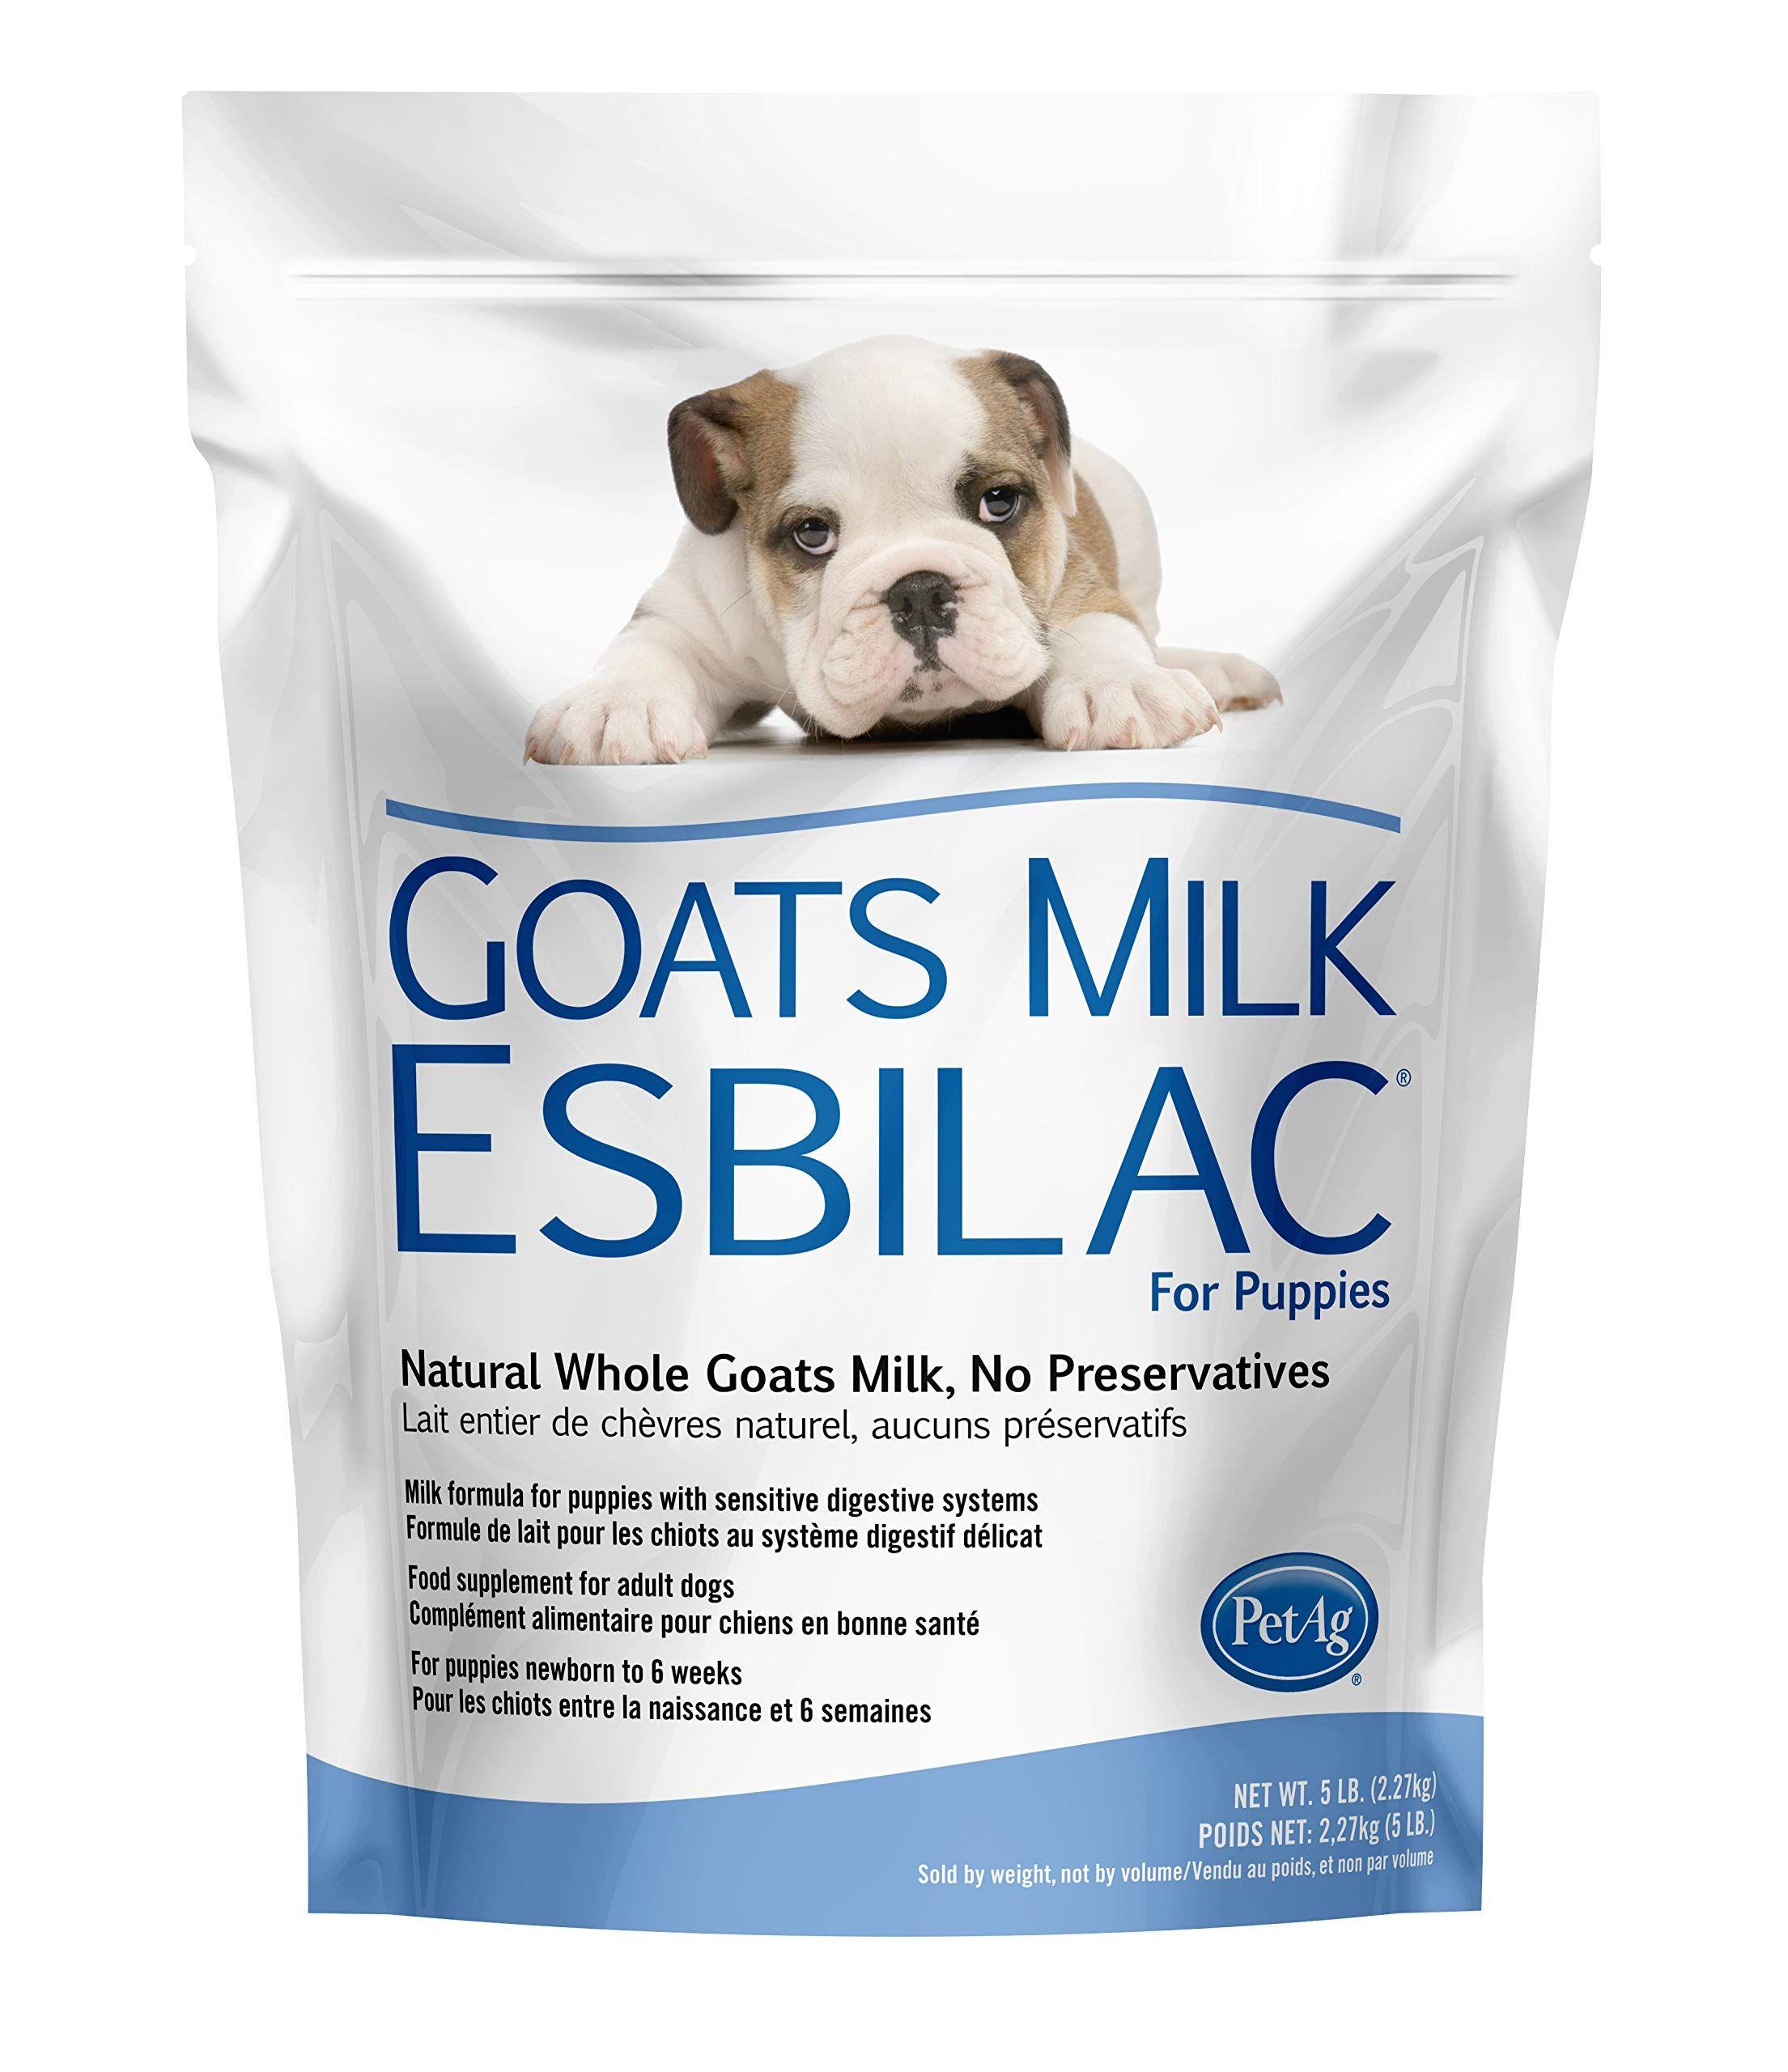 Goat S Milk Esbilac Gme Powder Milk Formula For Puppies With Sensitive Digestive Systems 5lb Click On In 2020 Milk Formula For Puppies Goat Milk Digestive System